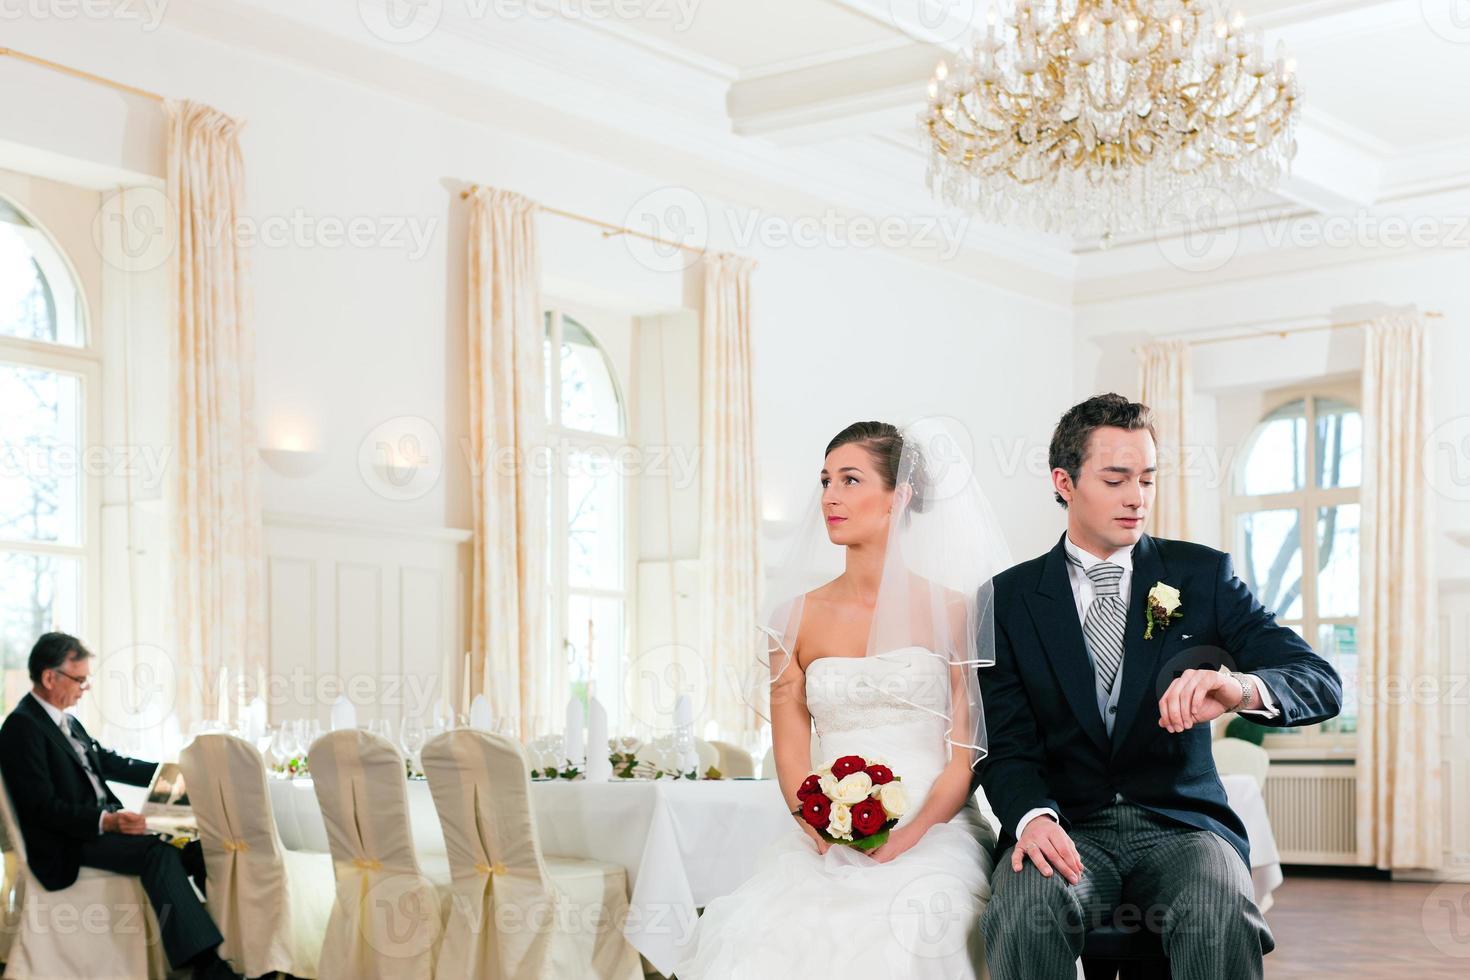 Bridal couple waiting for ceremony photo